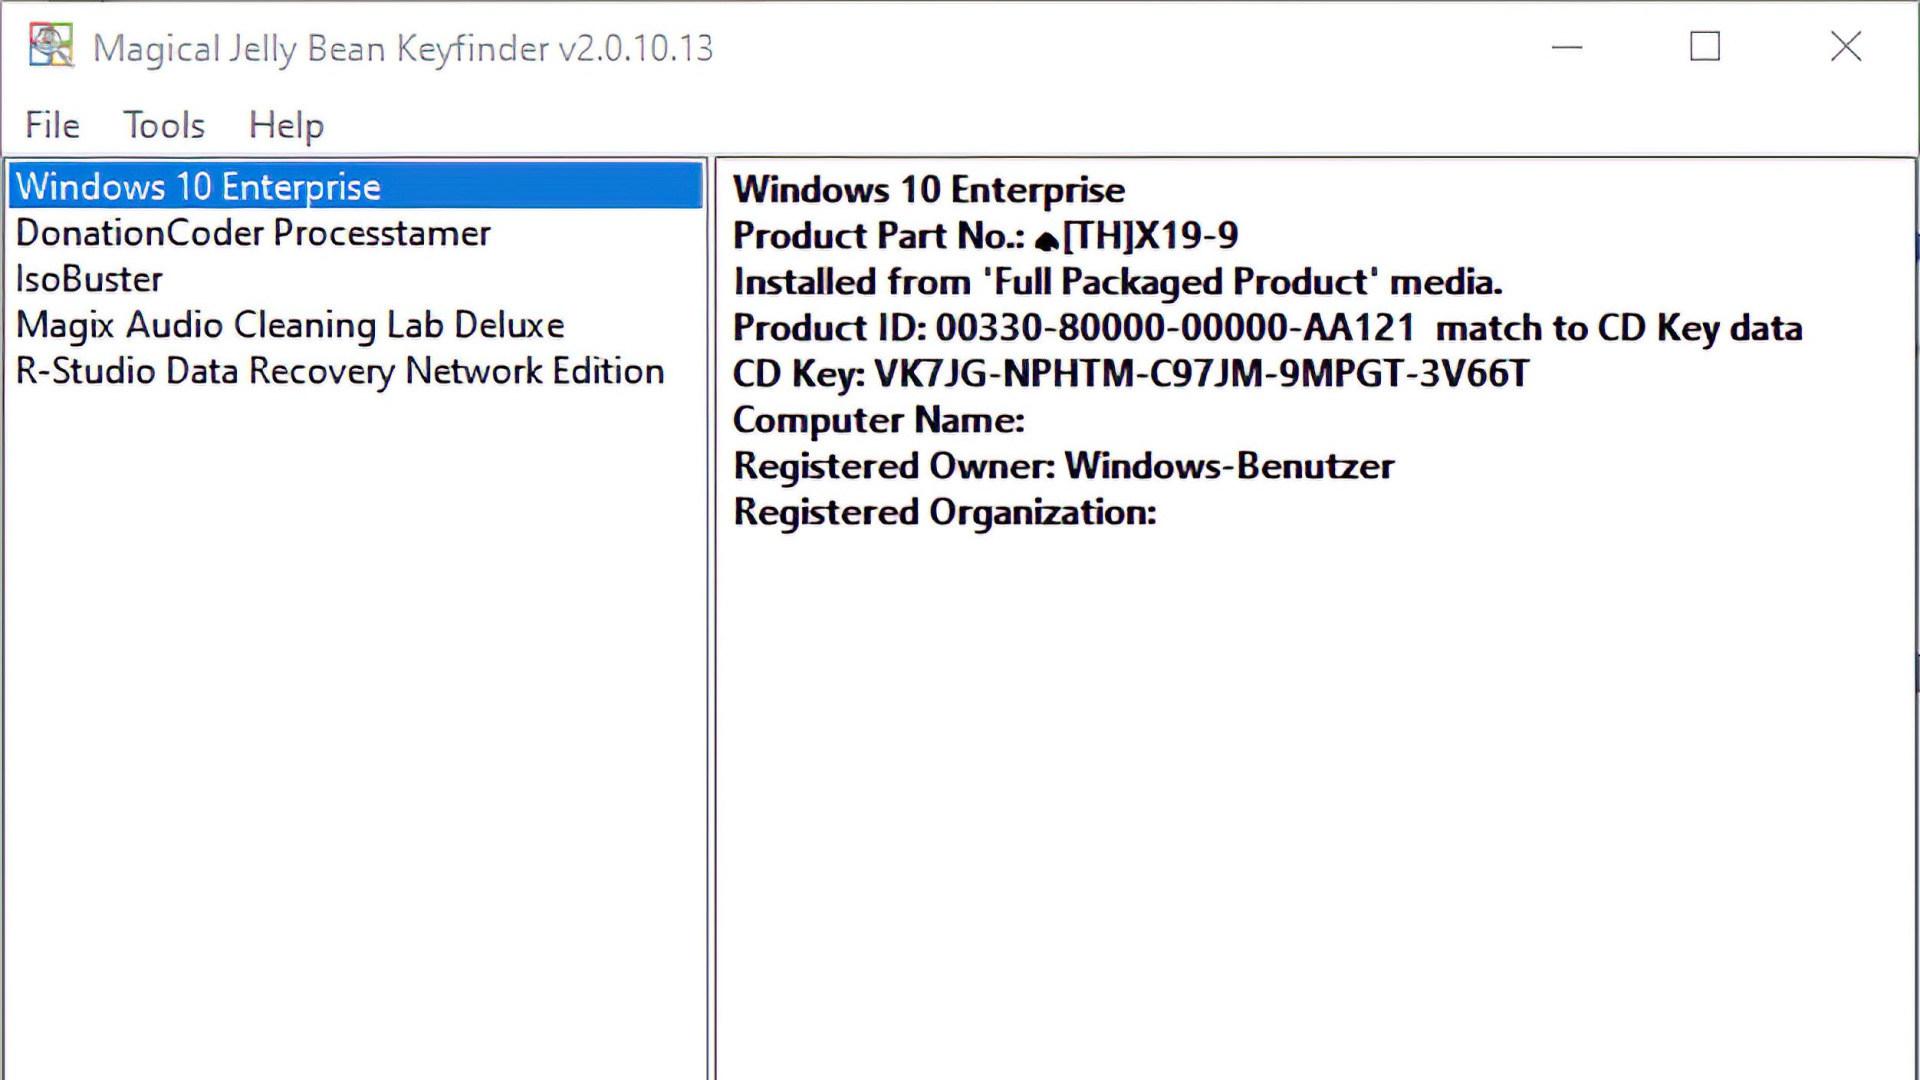 Windows, Magical Jelly Bean Keyfinder, Keyfinder